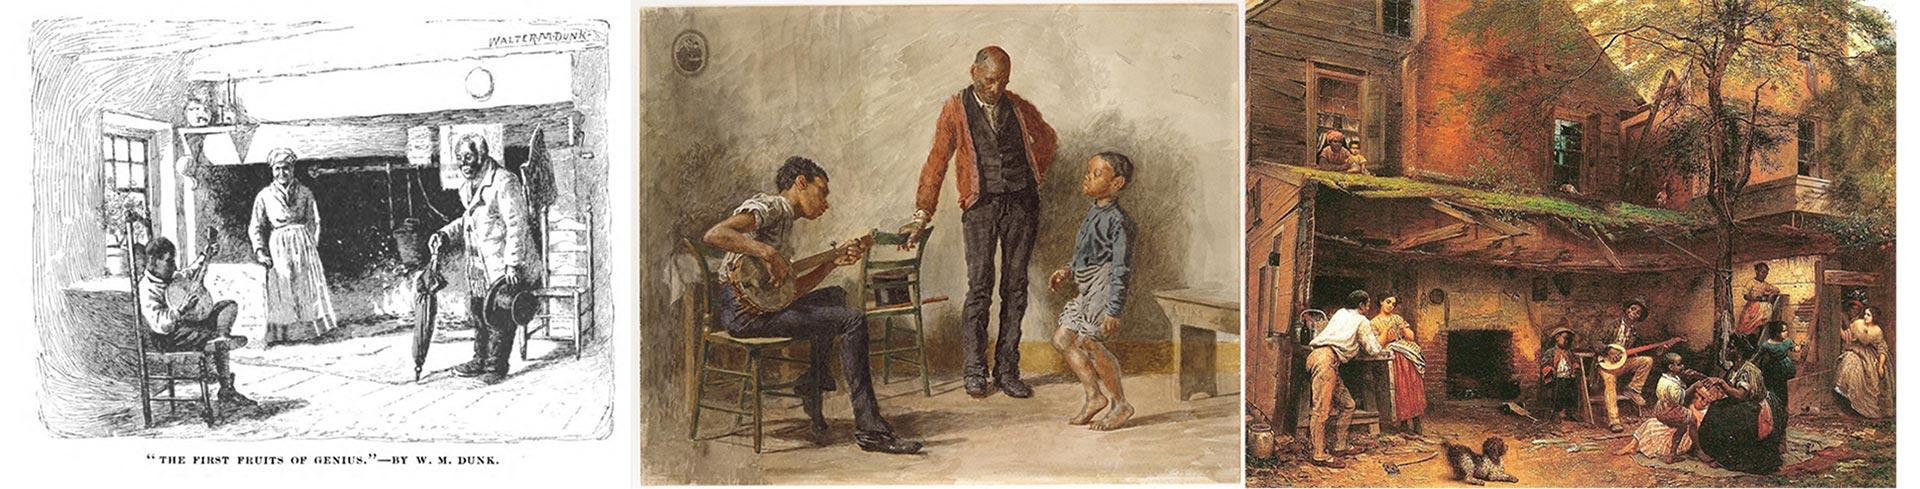 Grabado de Walter M. Dunk y pinturas de Thomas Eakins e Eastman Johnson